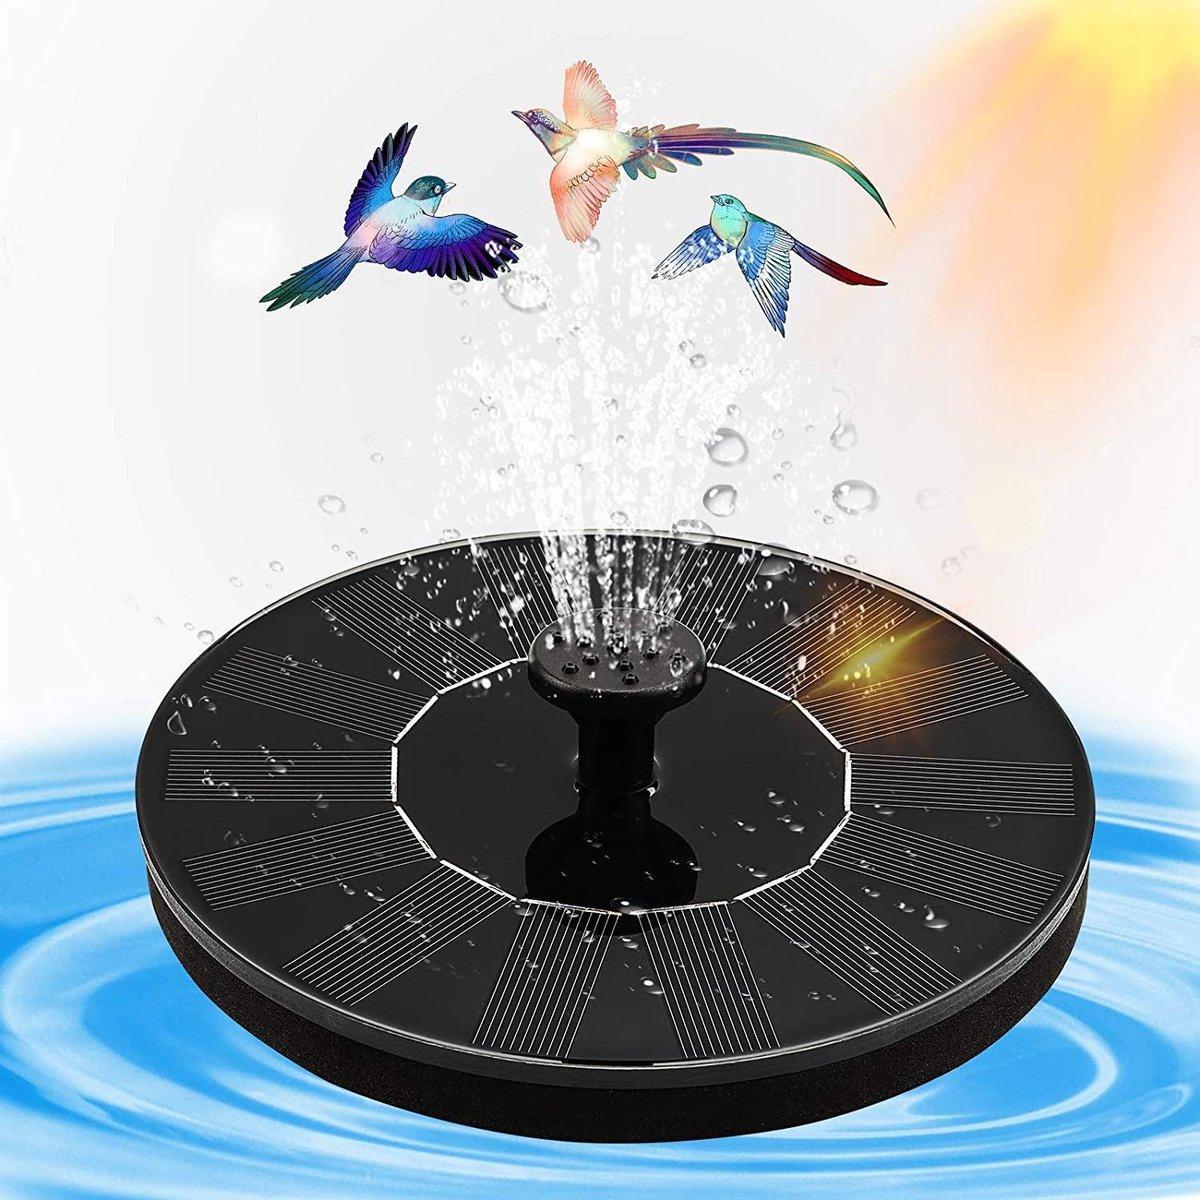 Fontein op zonne energie - Solar fontein - Milieuvriendelijk - Vogelbad